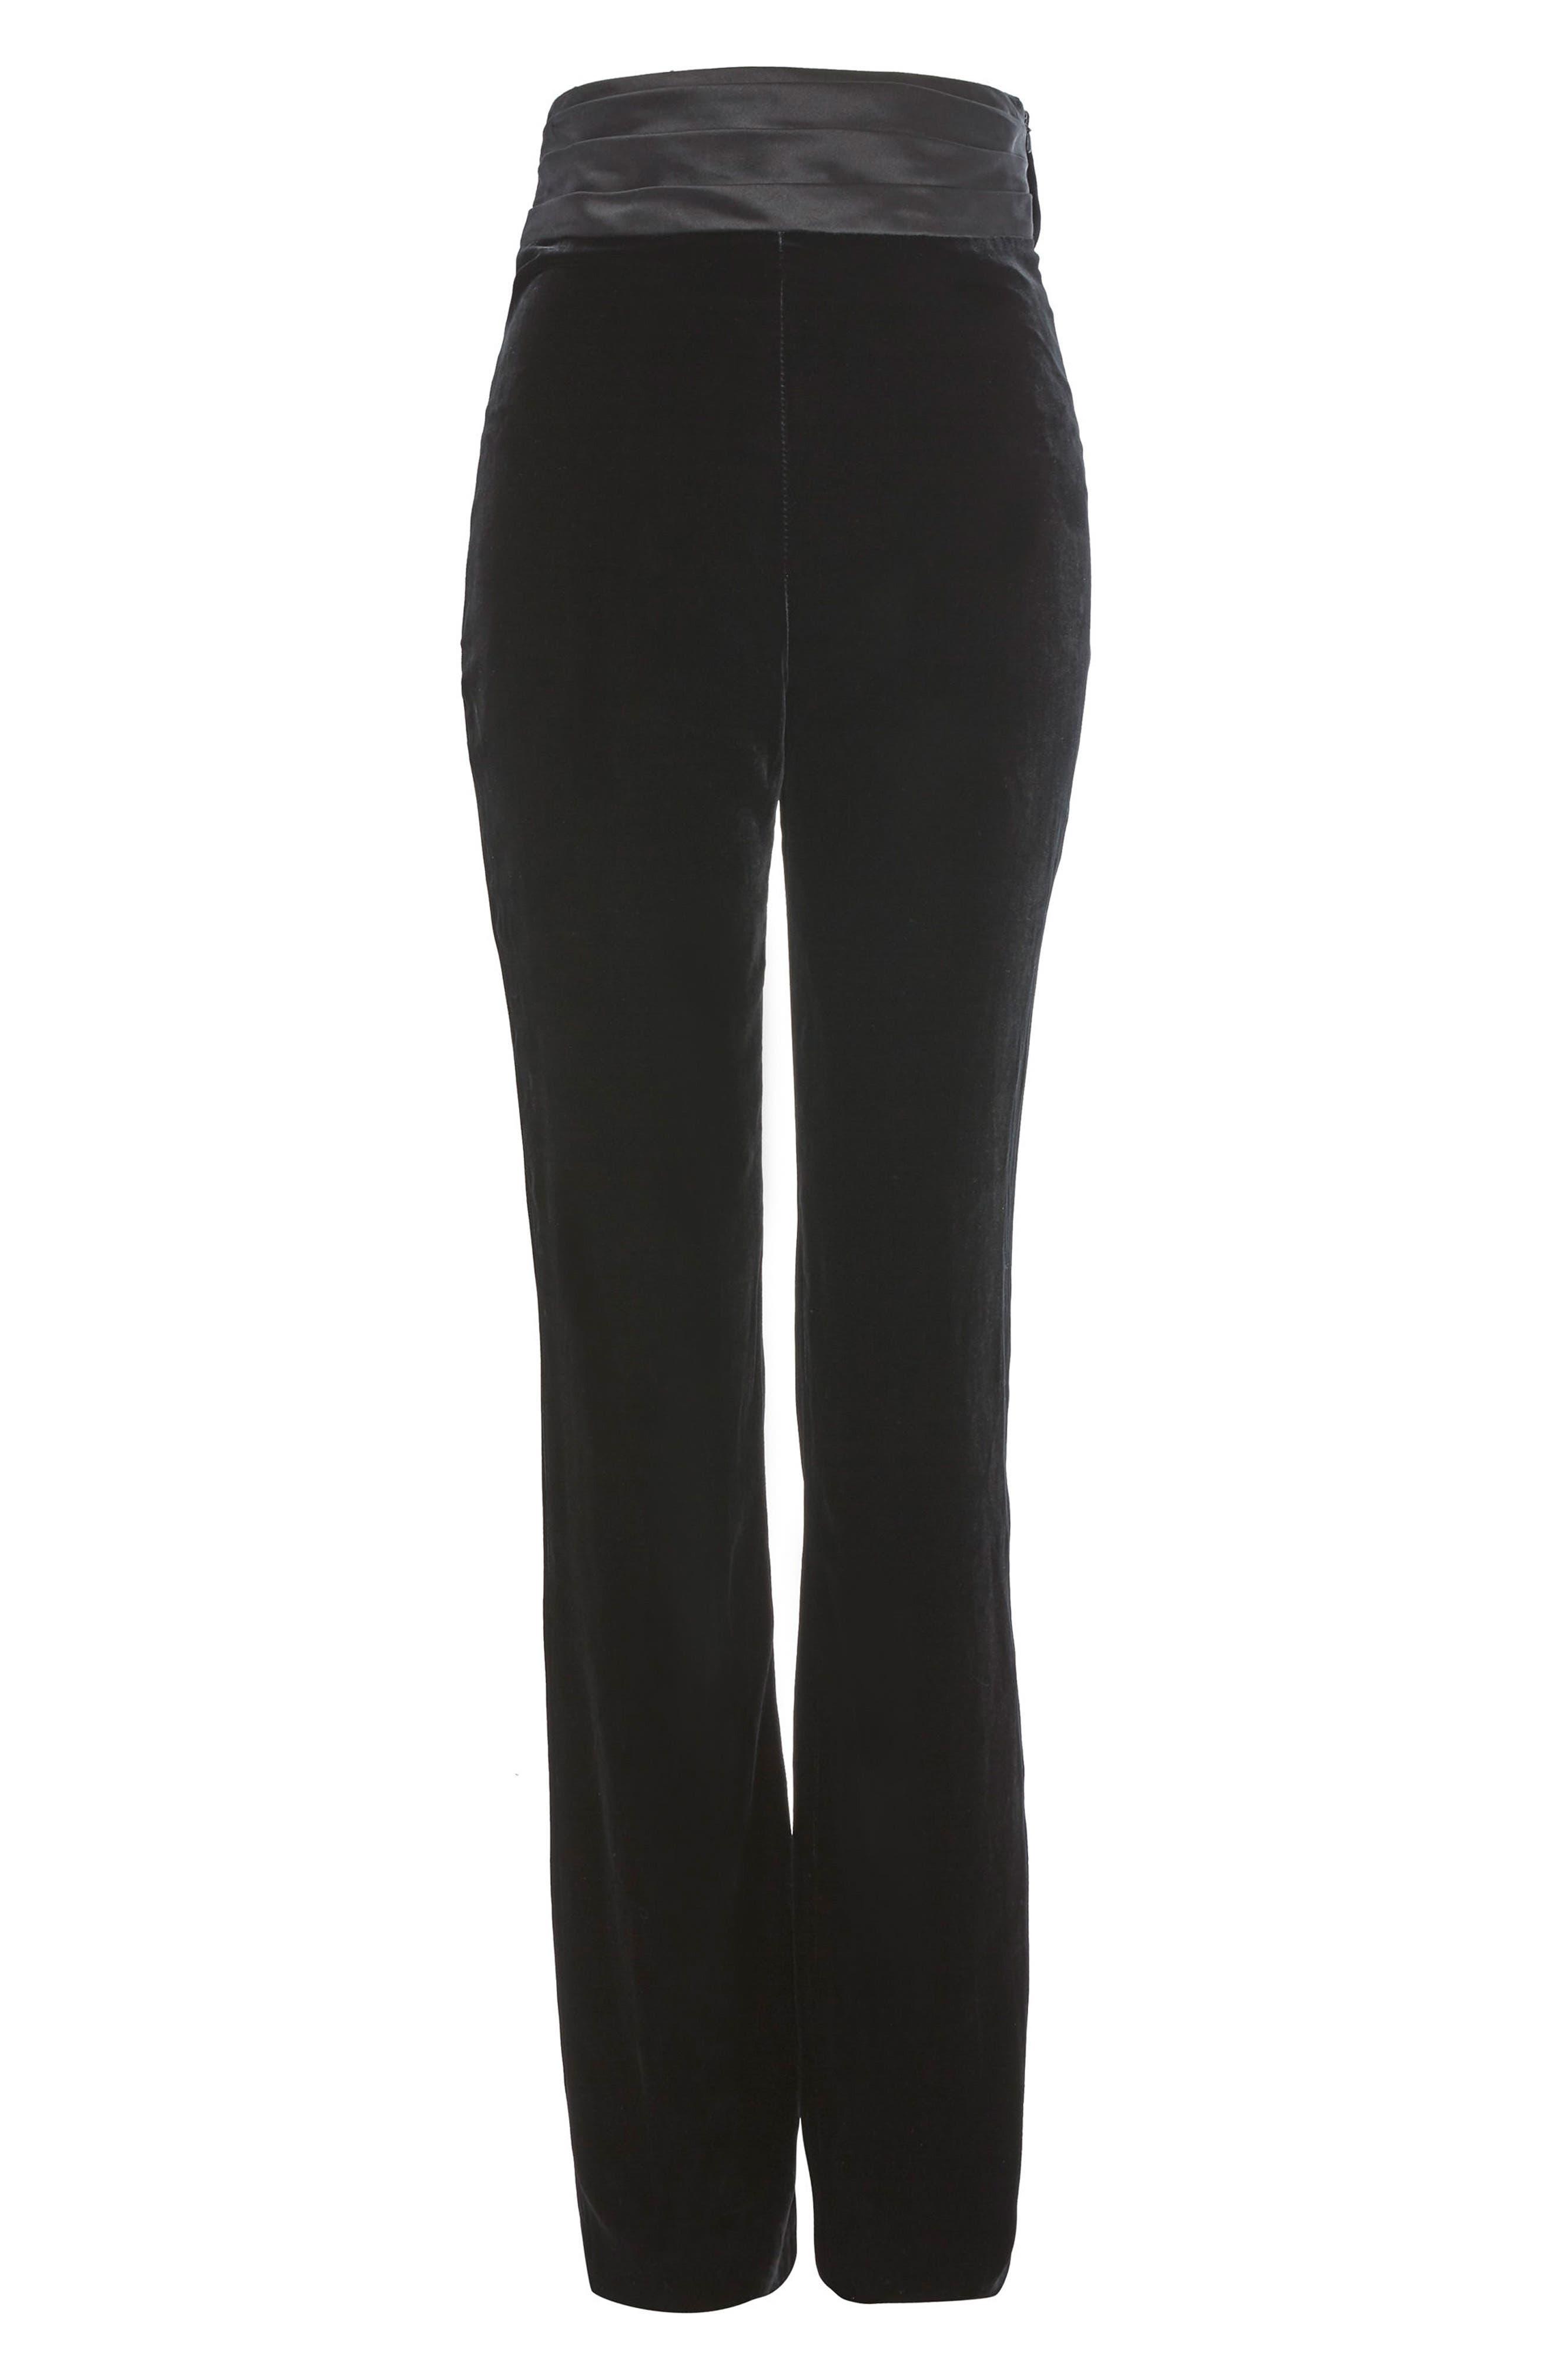 Main Image - Topshop Cummerbund Trousers